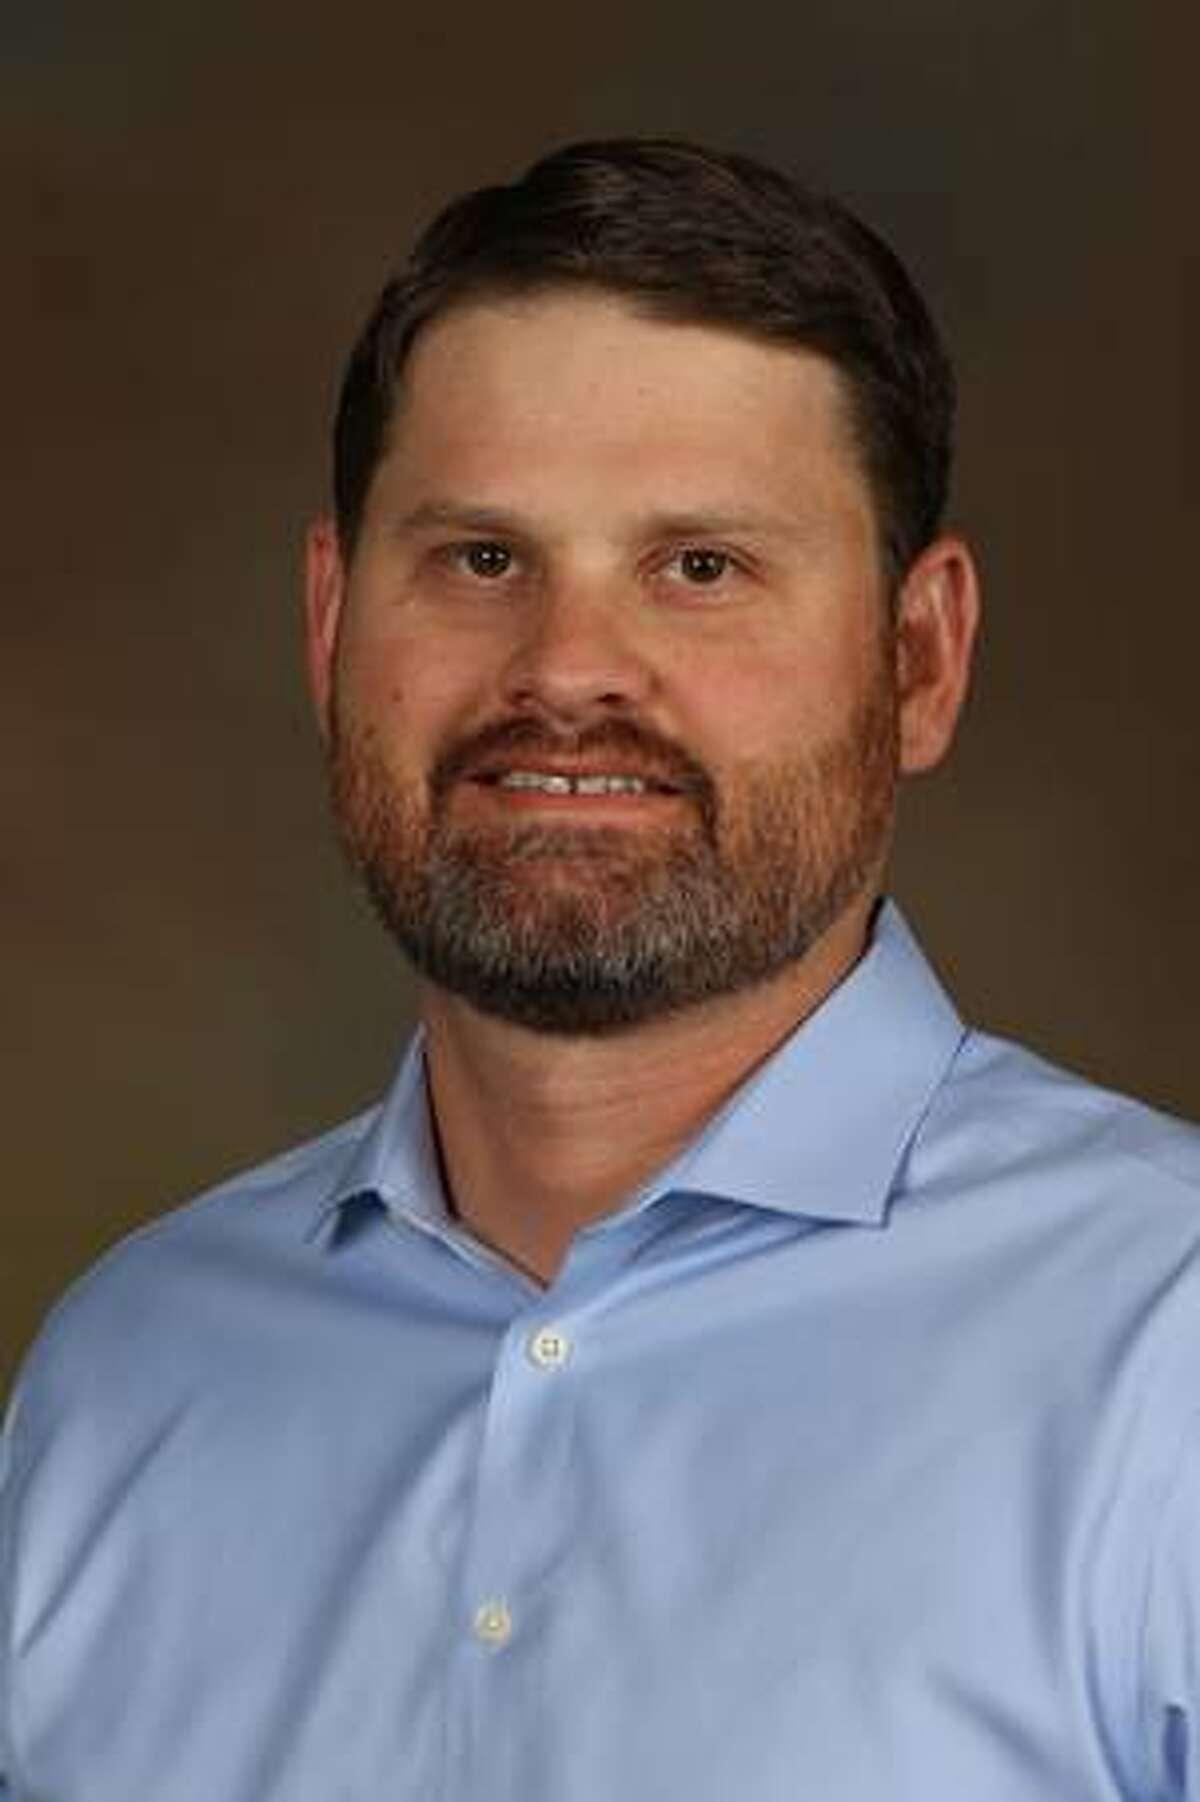 Jeff Beard,Midland County Hospital District board president